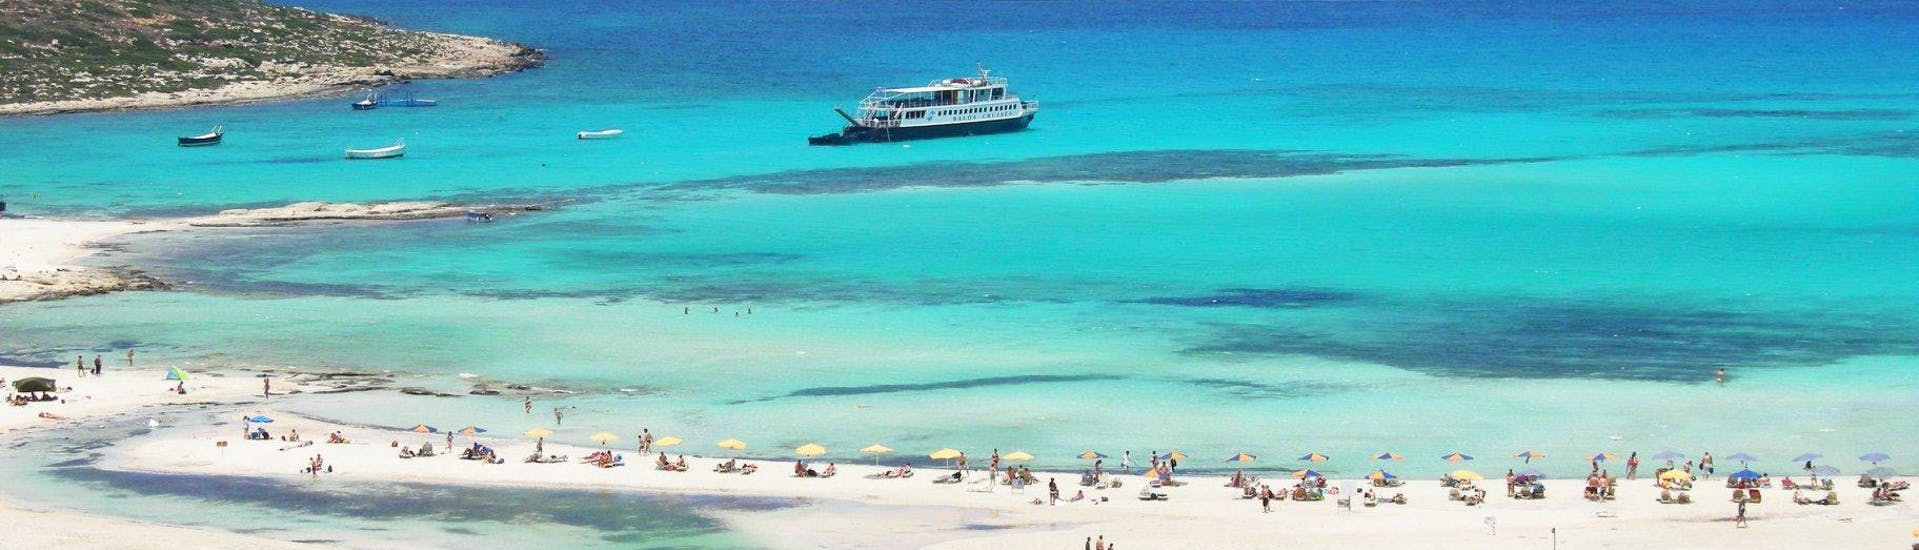 The beautiful Balos Lagoon during a boat trip to Balos & Gramvousa from Kissamos with Cretan Daily Cruises.